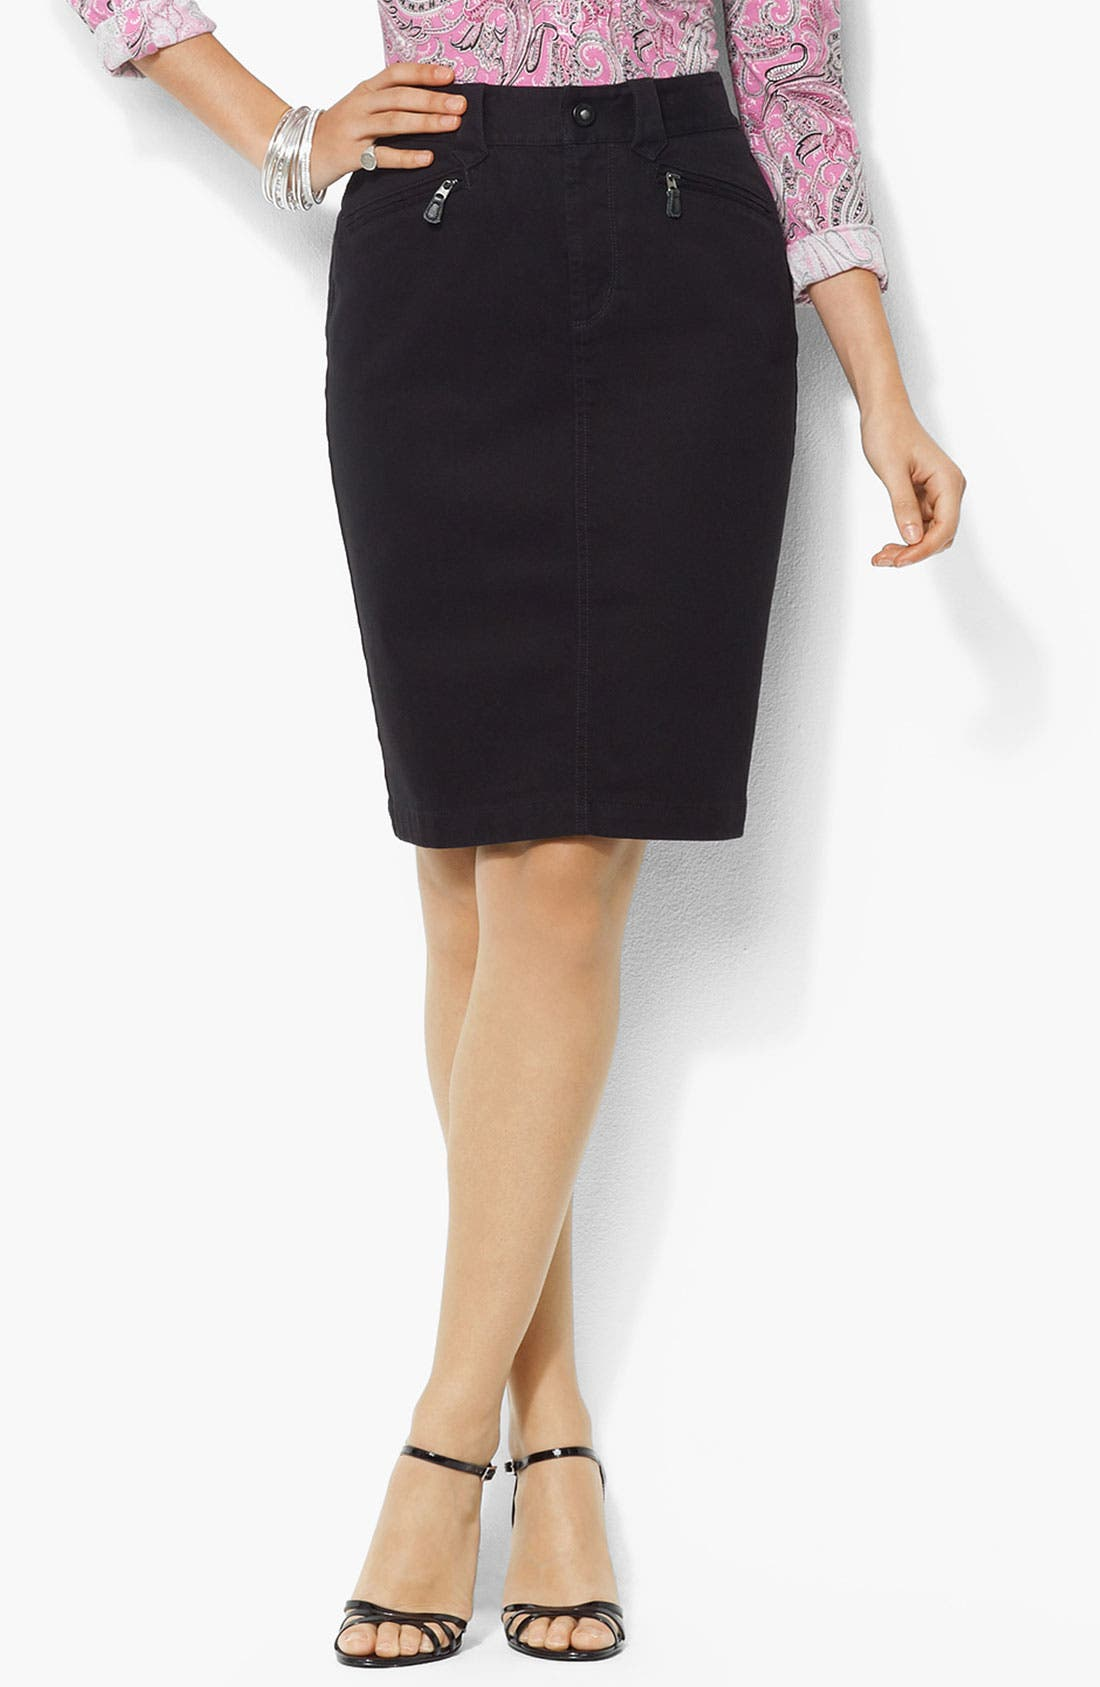 Alternate Image 1 Selected - Lauren Ralph Lauren Denim Skirt (Plus)